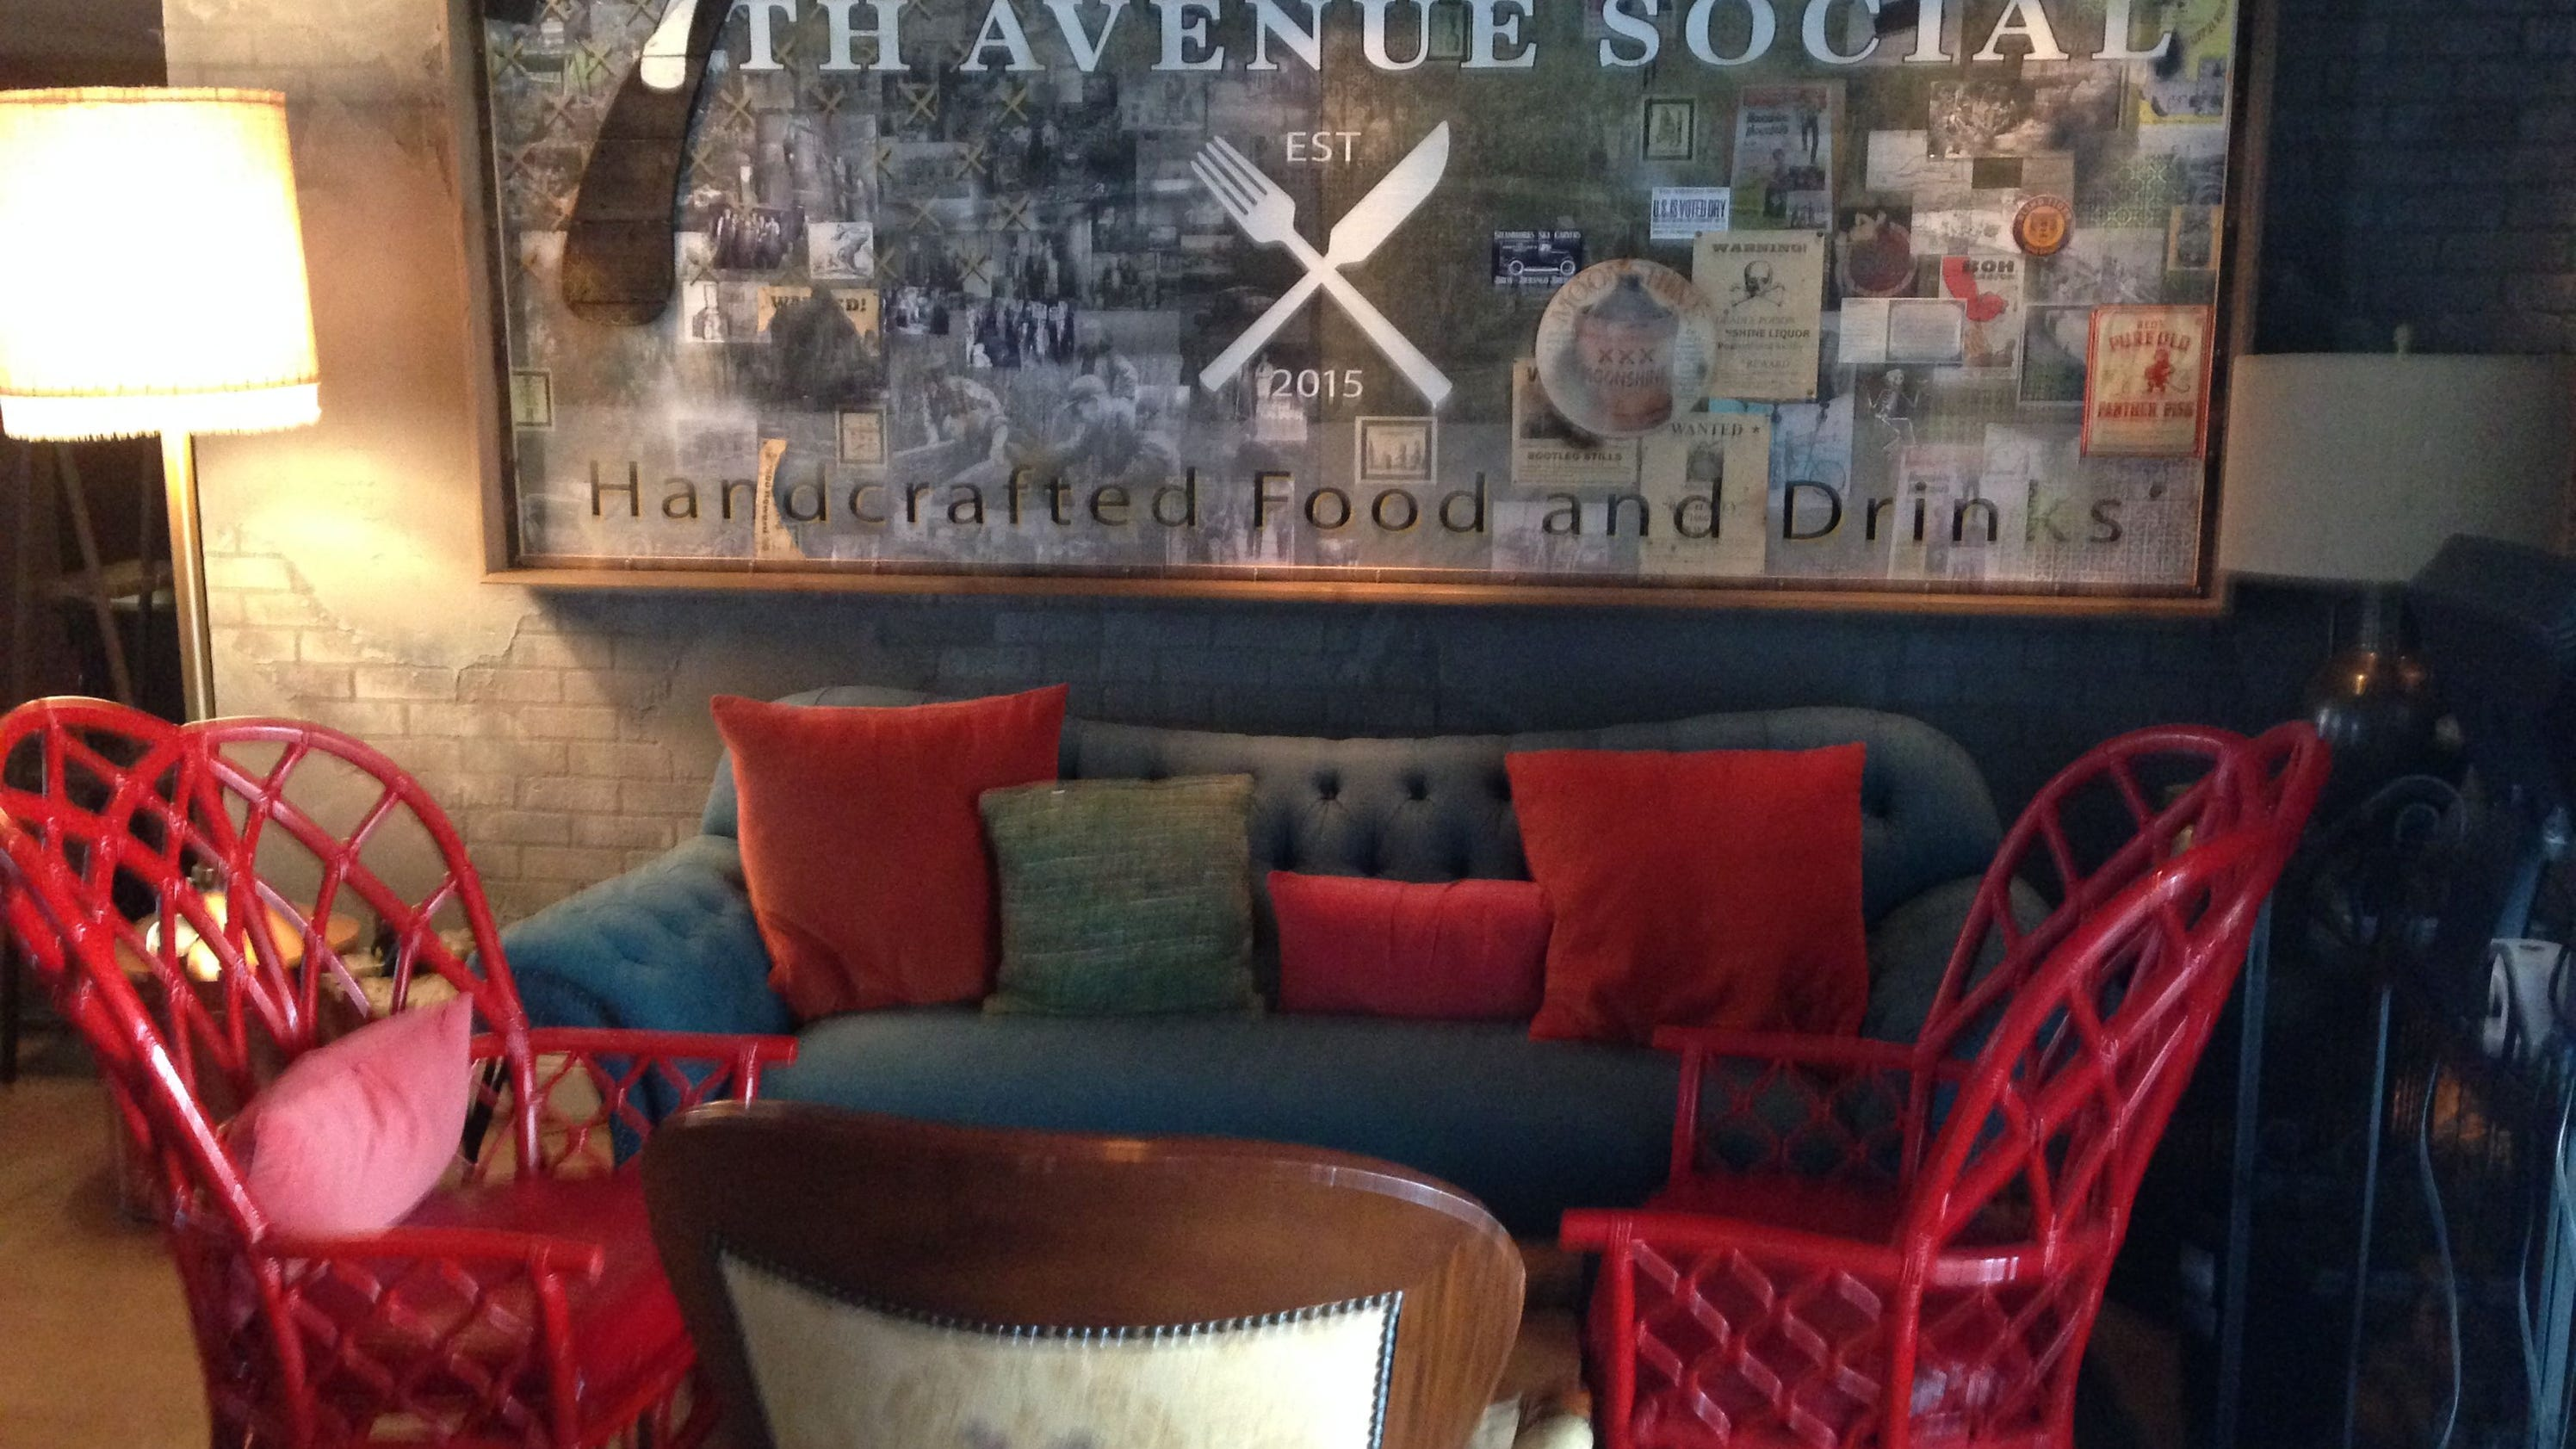 Eclectic food, decor highlight 7th Avenue Social